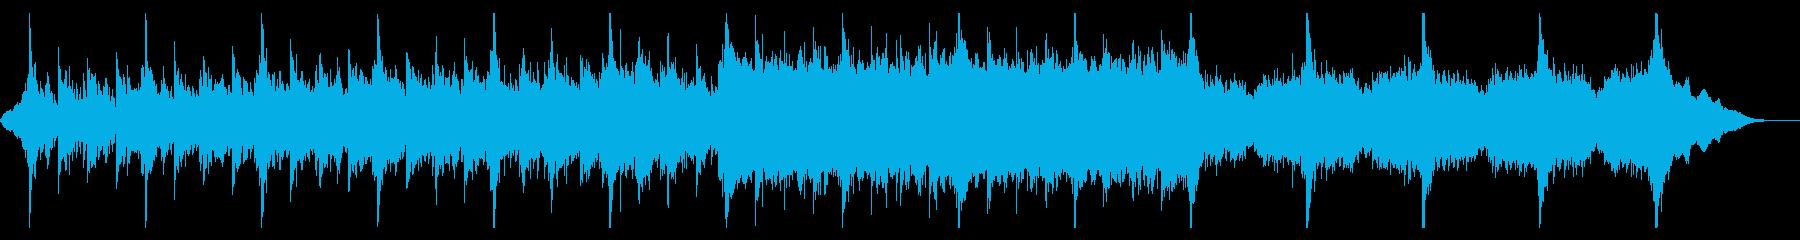 texture17の再生済みの波形